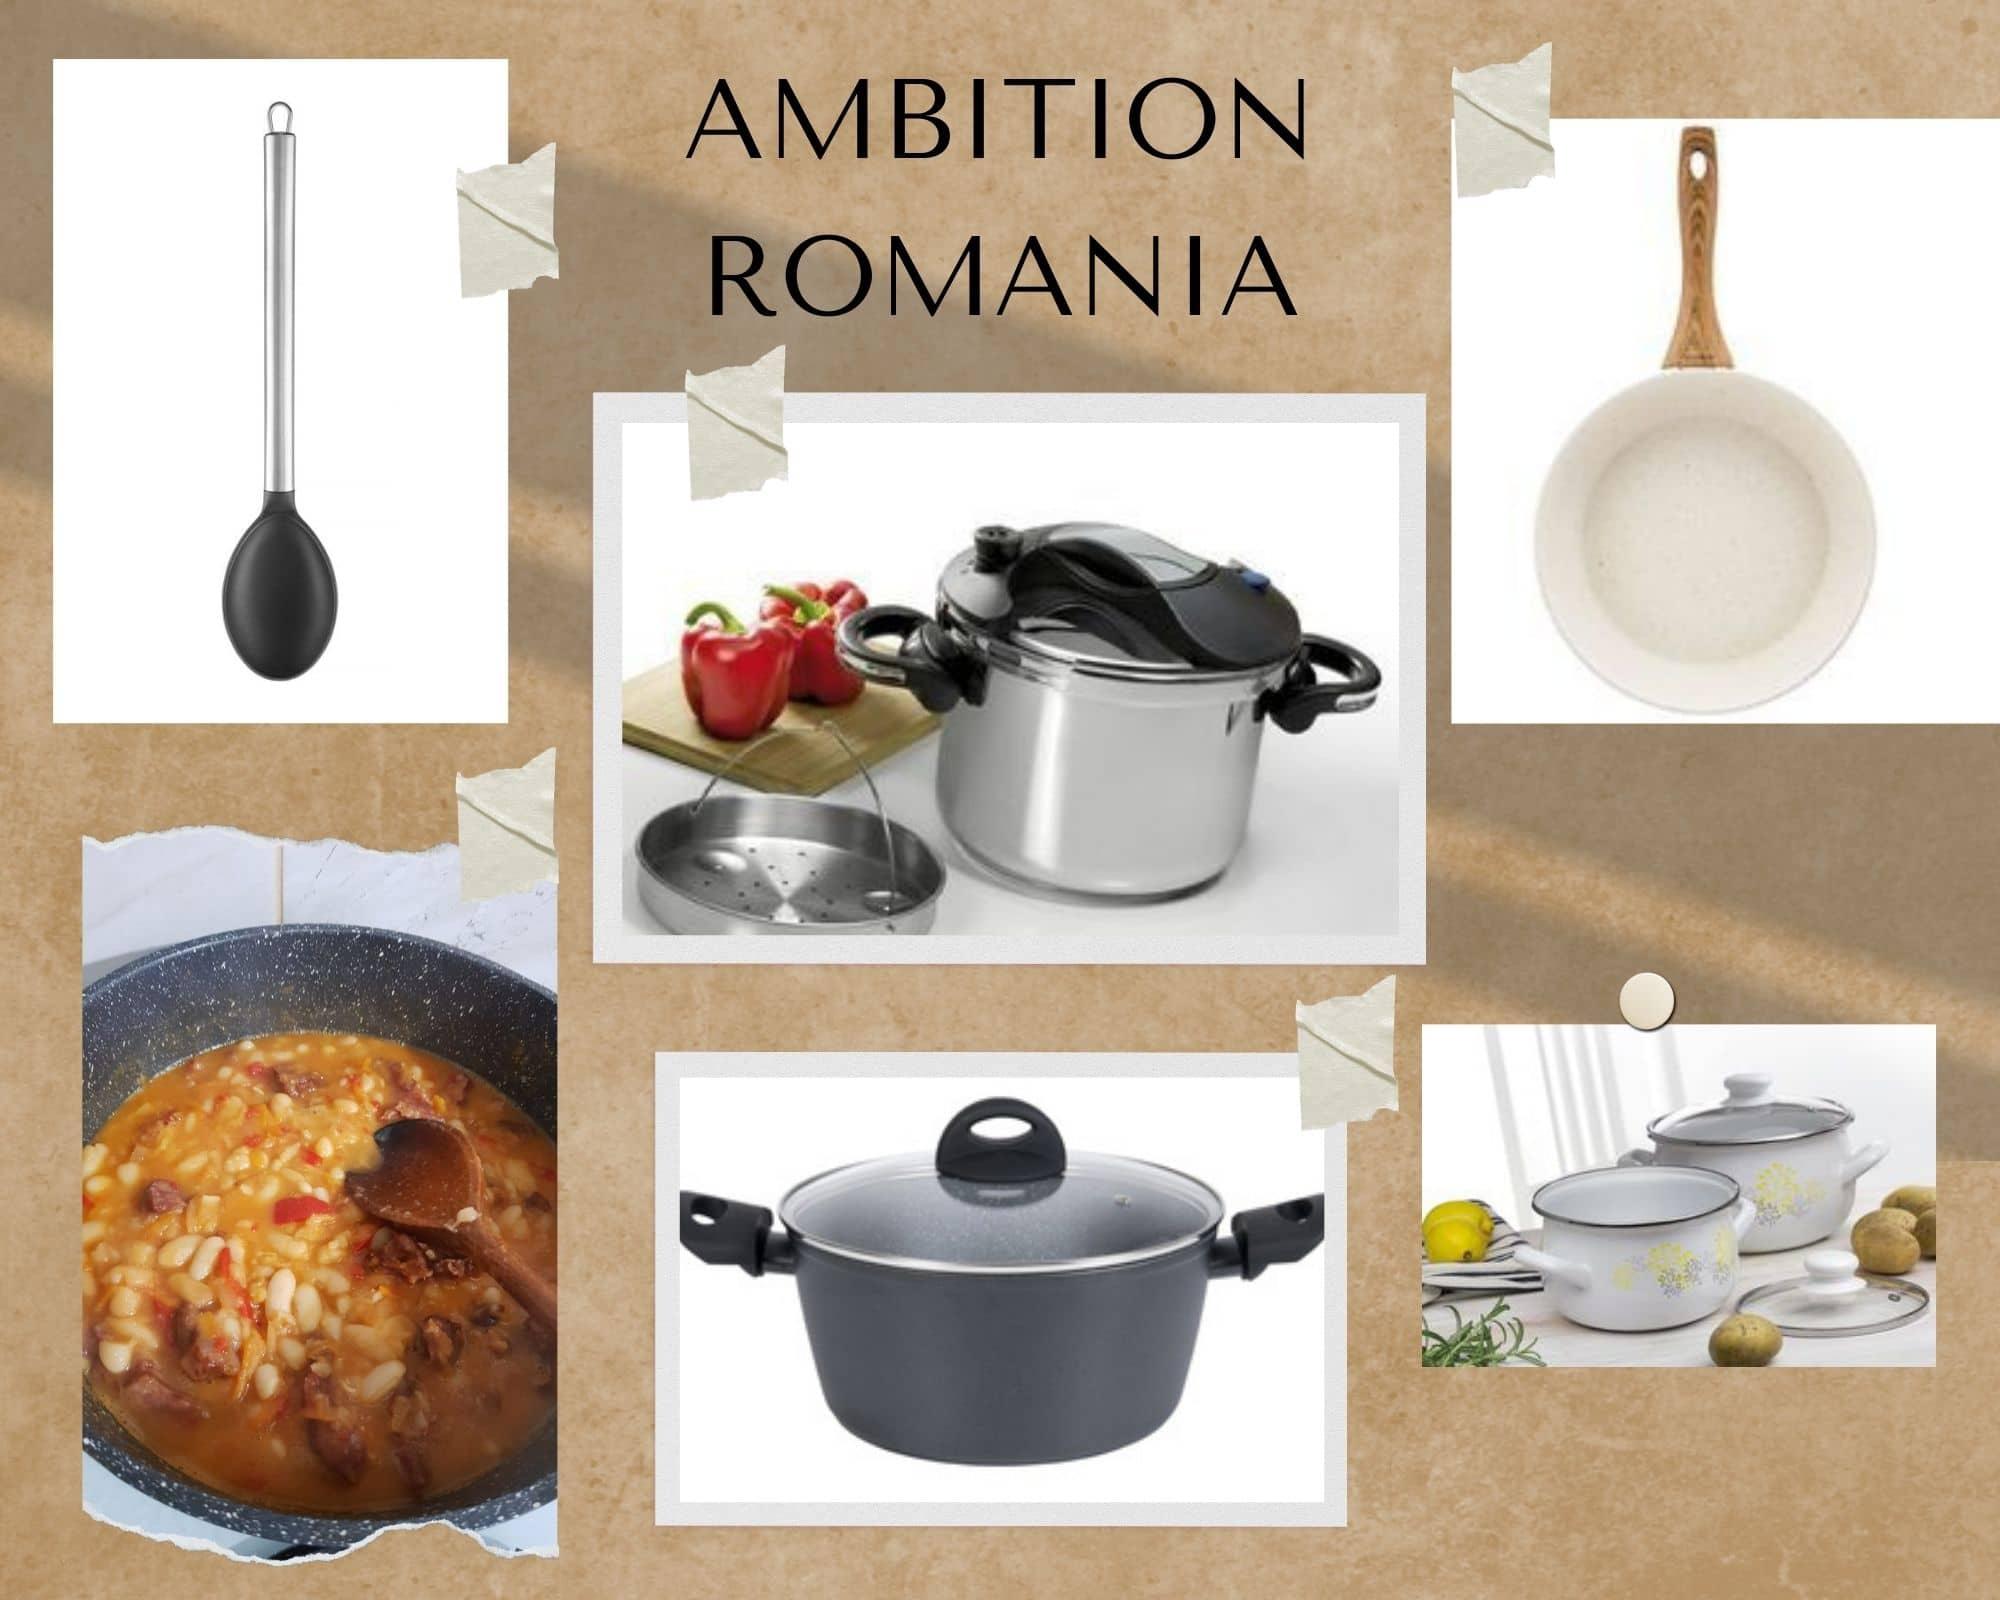 Ambition Romania